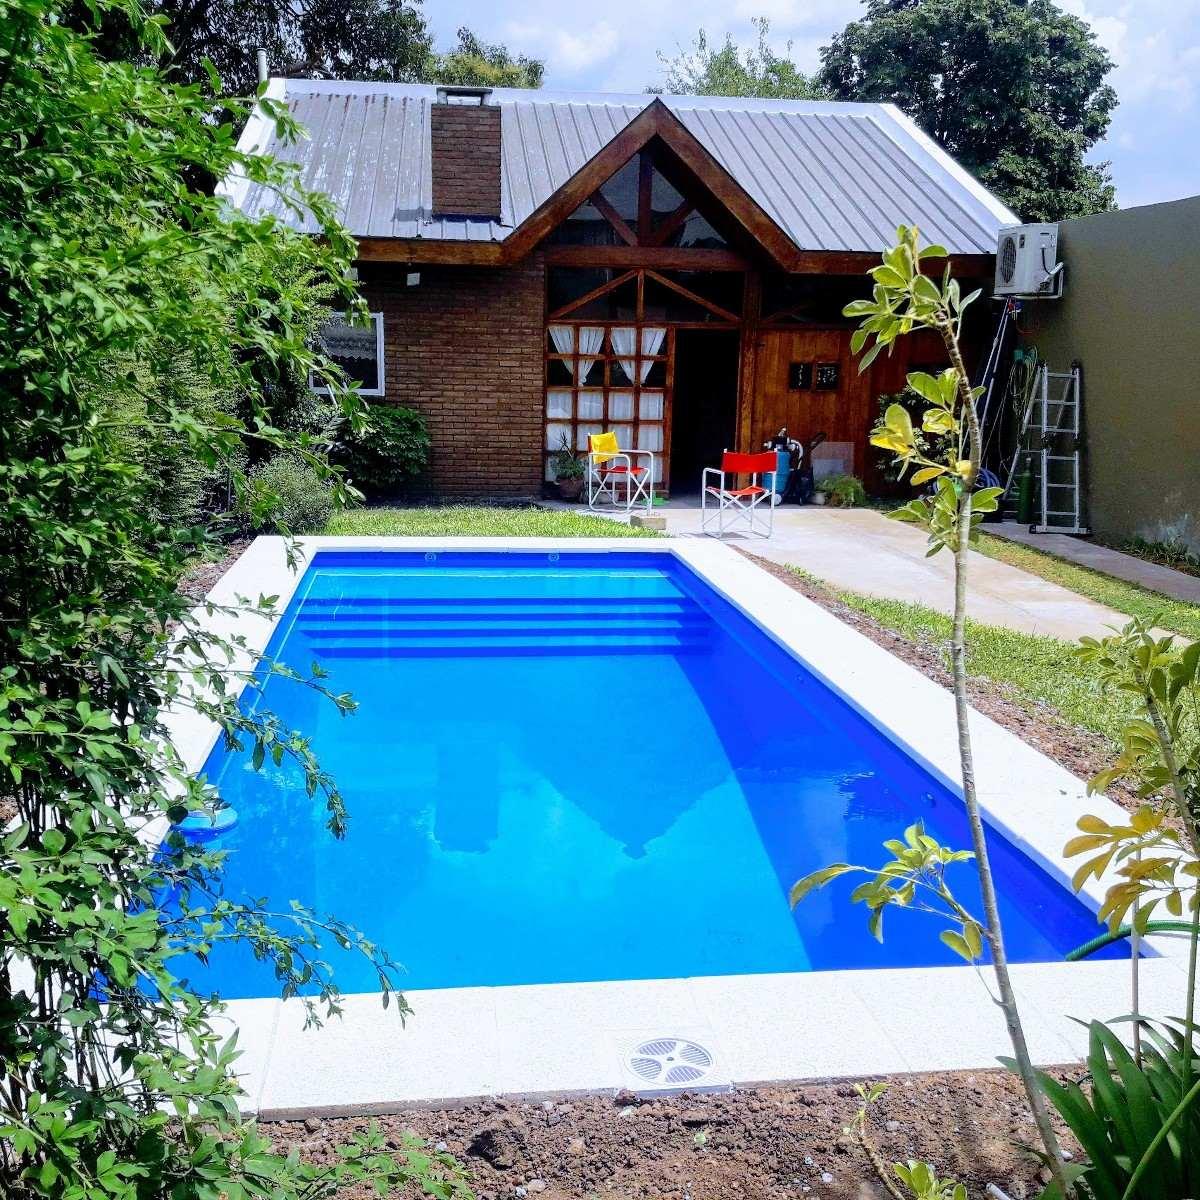 Piscinas 8x4 hormig n bluepoint en mercado libre for Constructores de piscinas